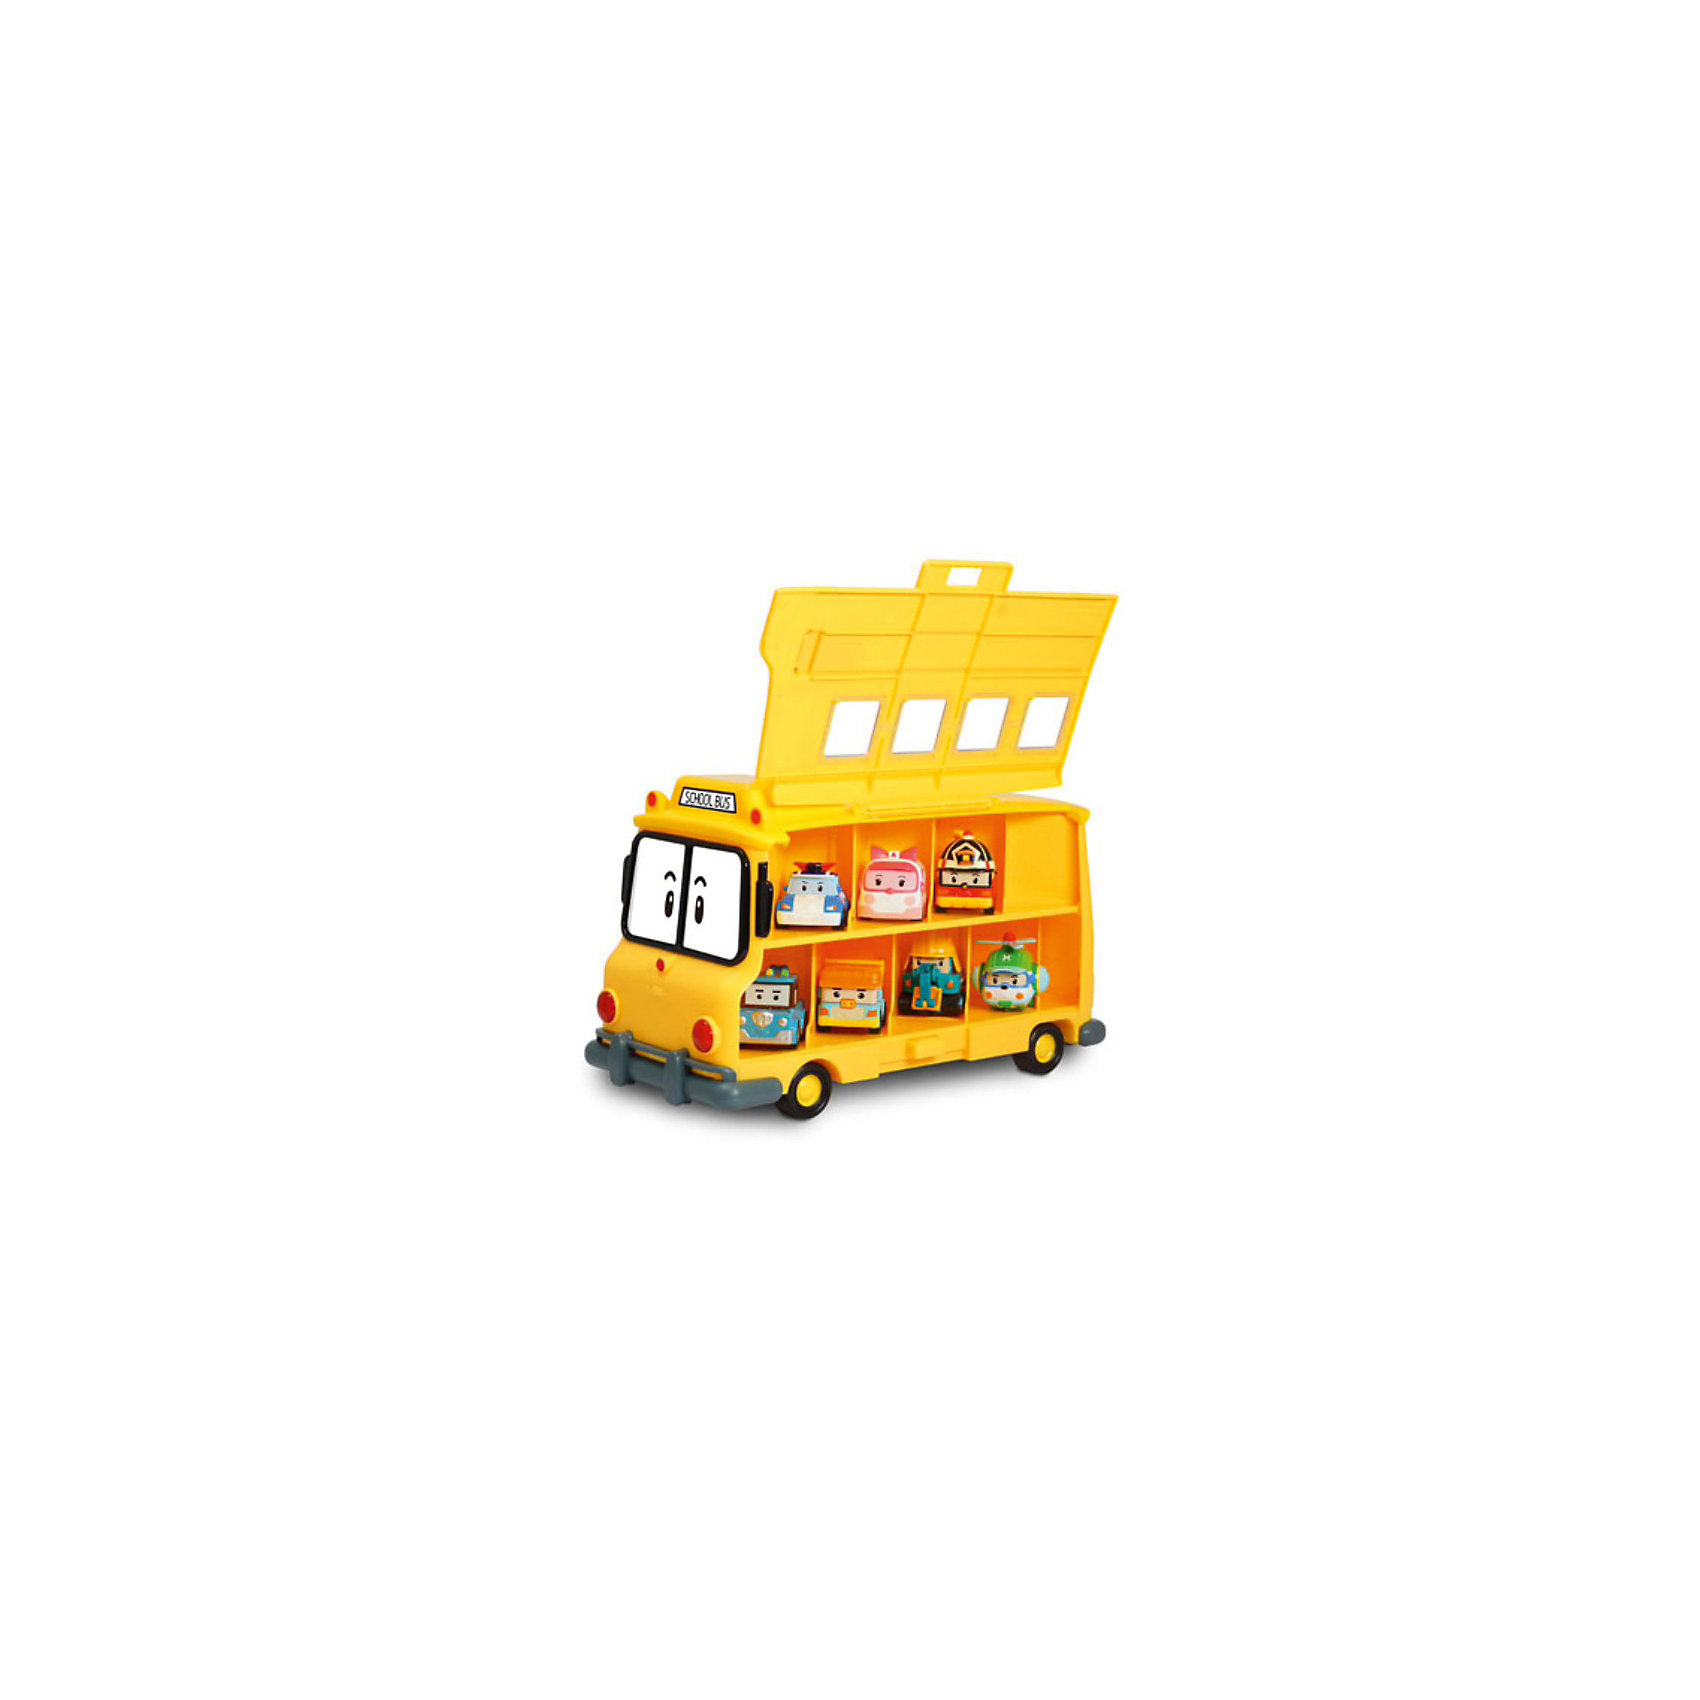 Silverlit Кейс д��я хранения машинок Скулби, Робокар Поли robocar poli кейс для хранения машинок скулби